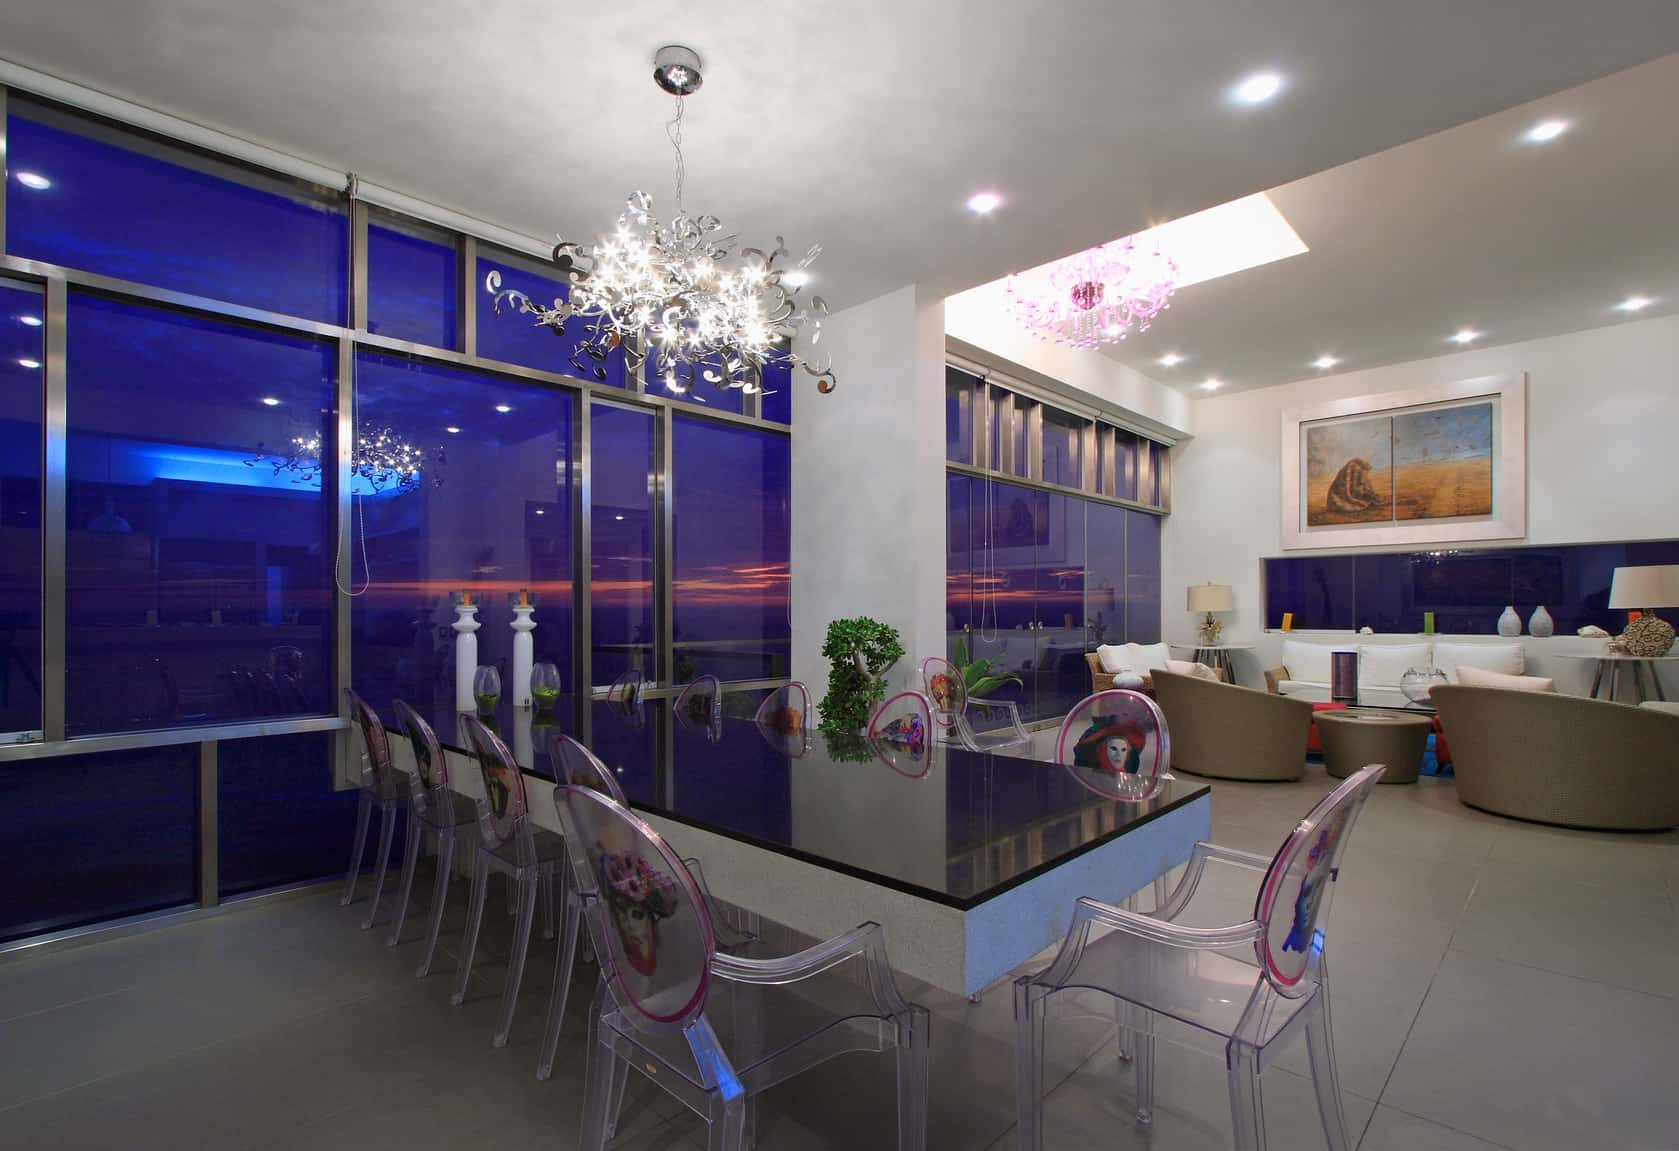 Alvarez Beach House in Peru is a Visual Masterpiece